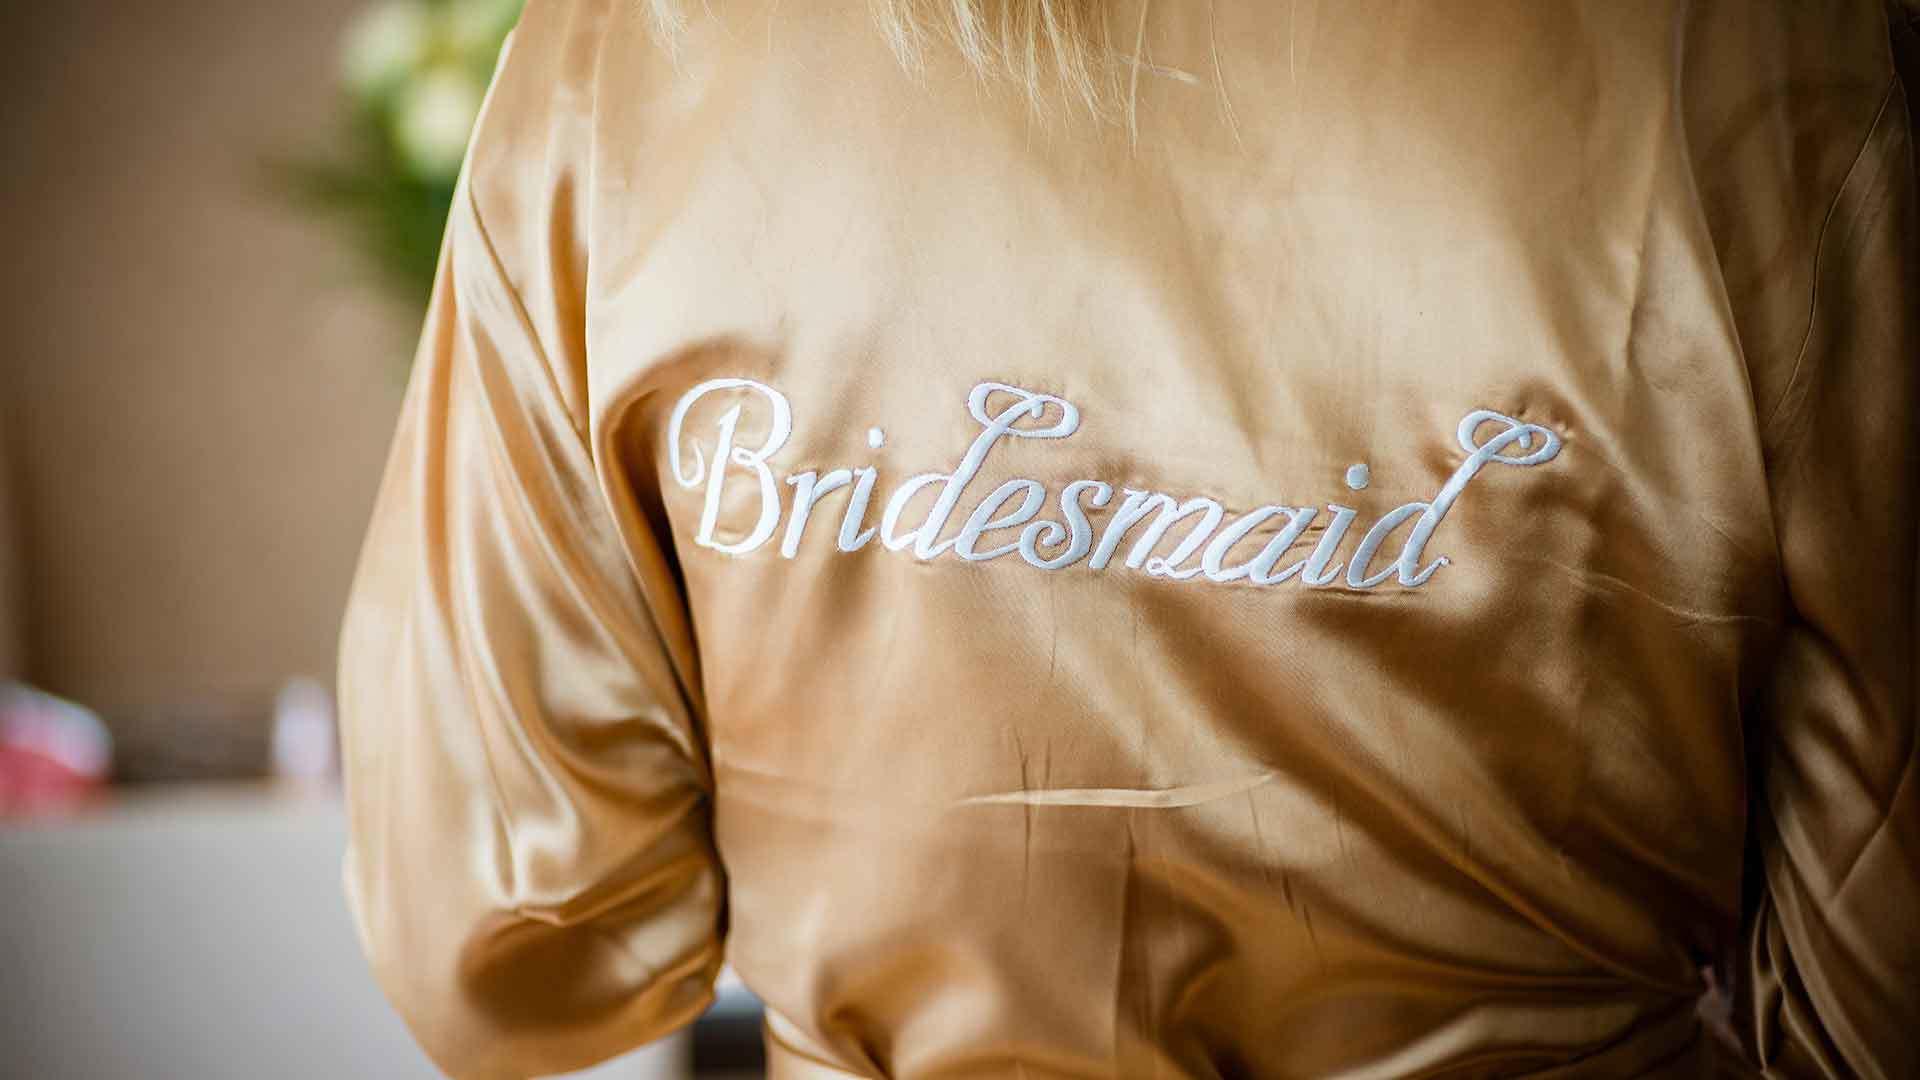 Bridesmaid - Getting Ready